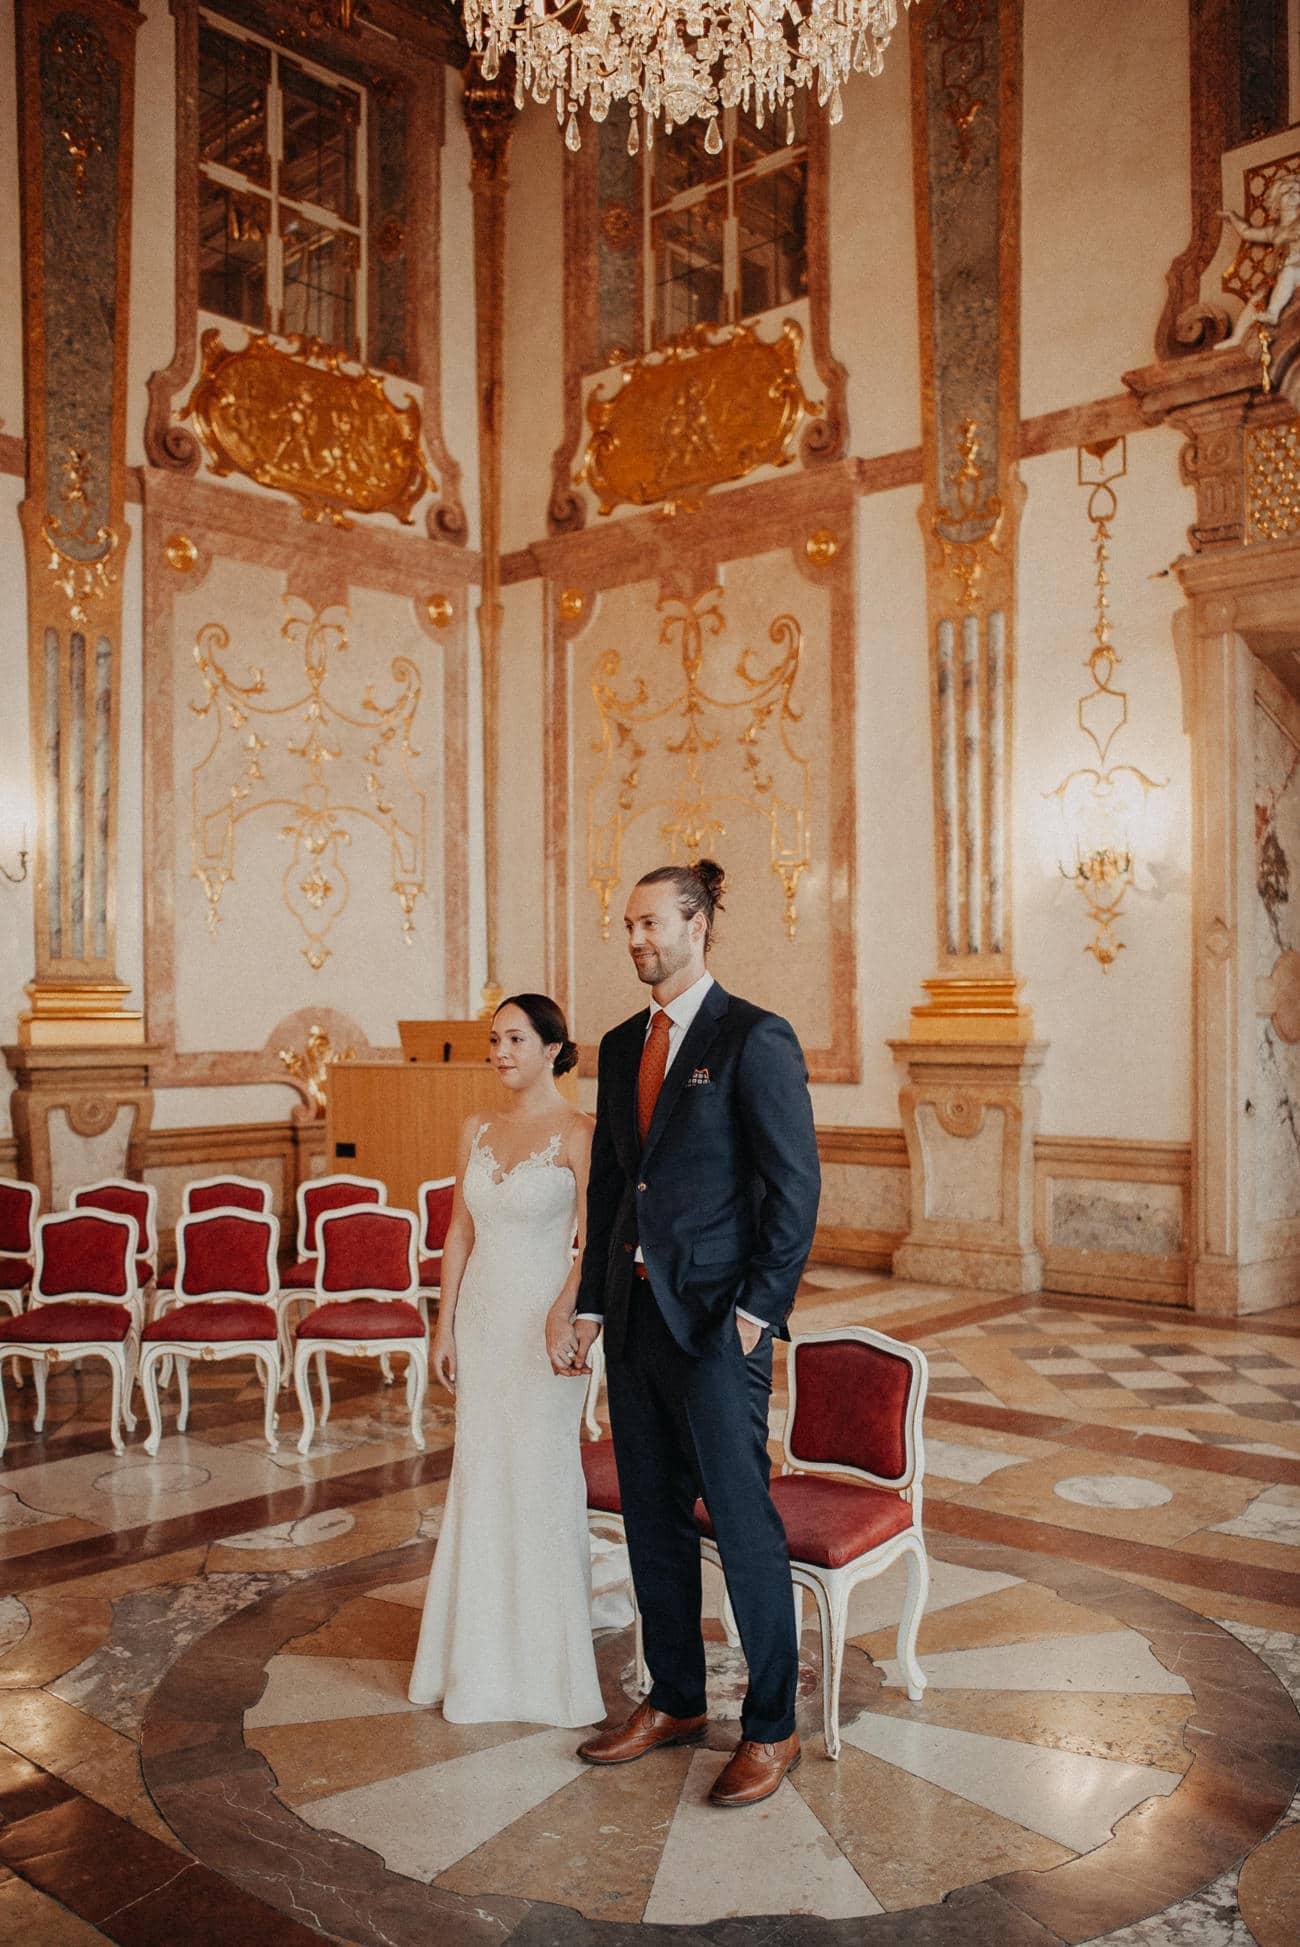 wedding photographer salzburg palace mirabell 042 - Mirabel Palace Wedding Photographer Salzburg